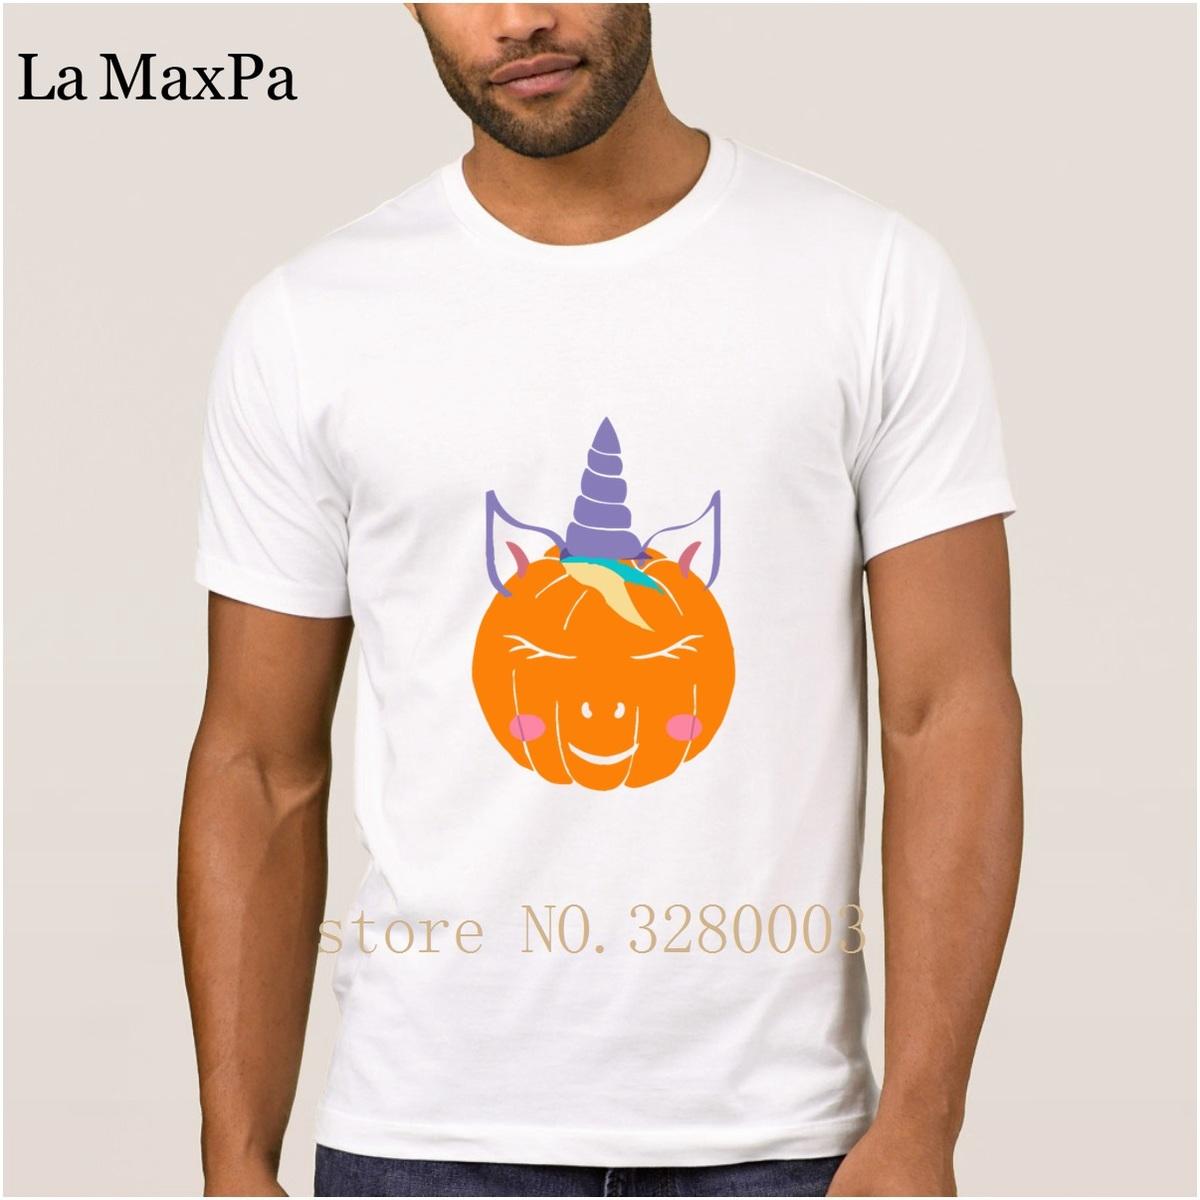 Popular Unicornio Hombre Maxpa Printing De Compre Camiseta La OWSvwtqnCR